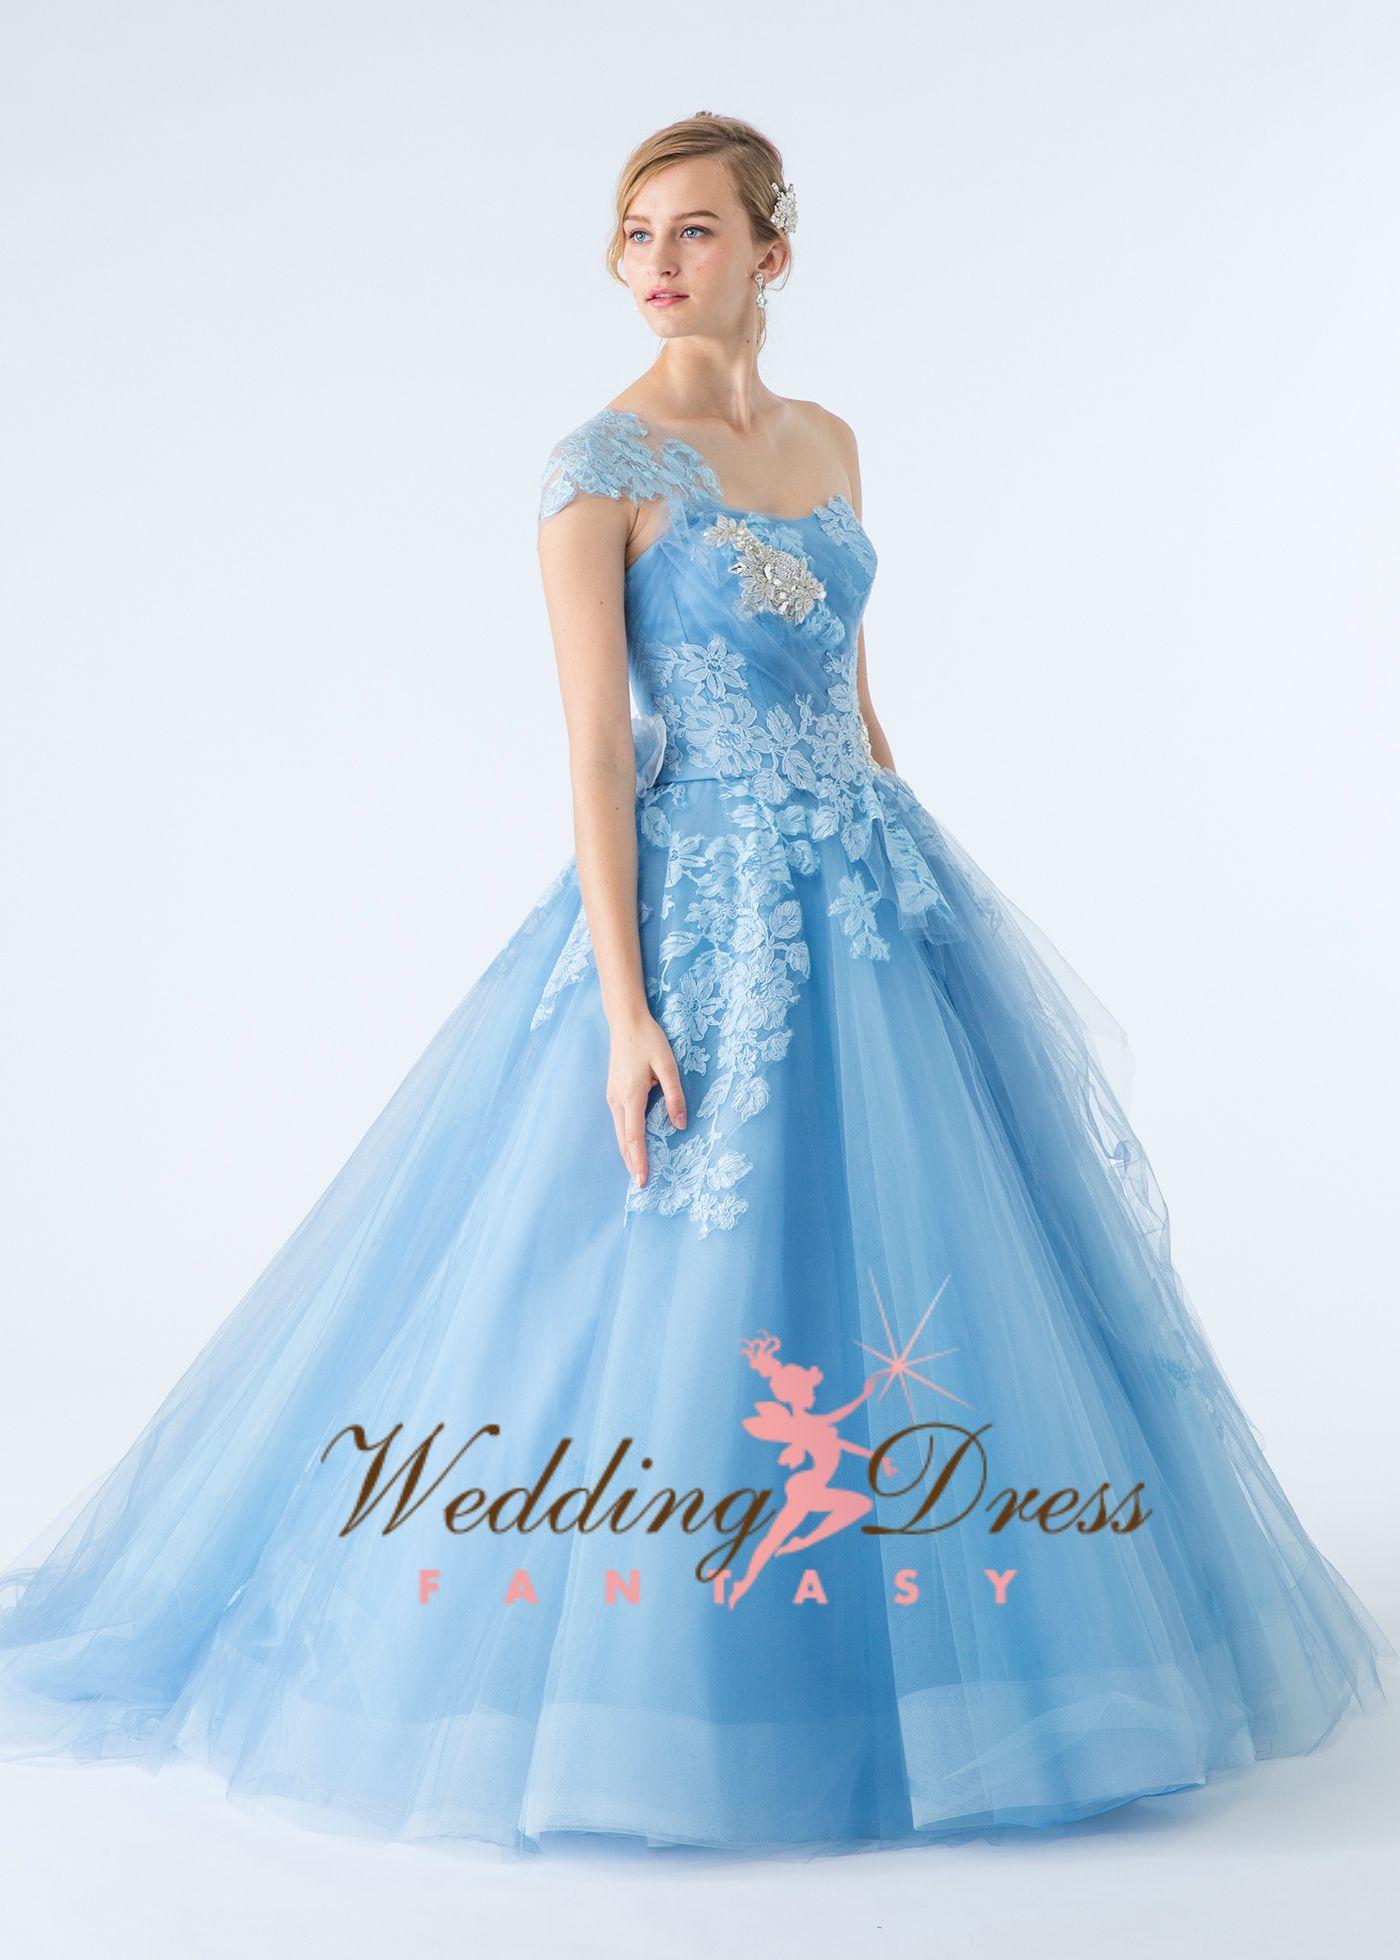 Light blue tulle wedding dress in gowns pinterest wedding